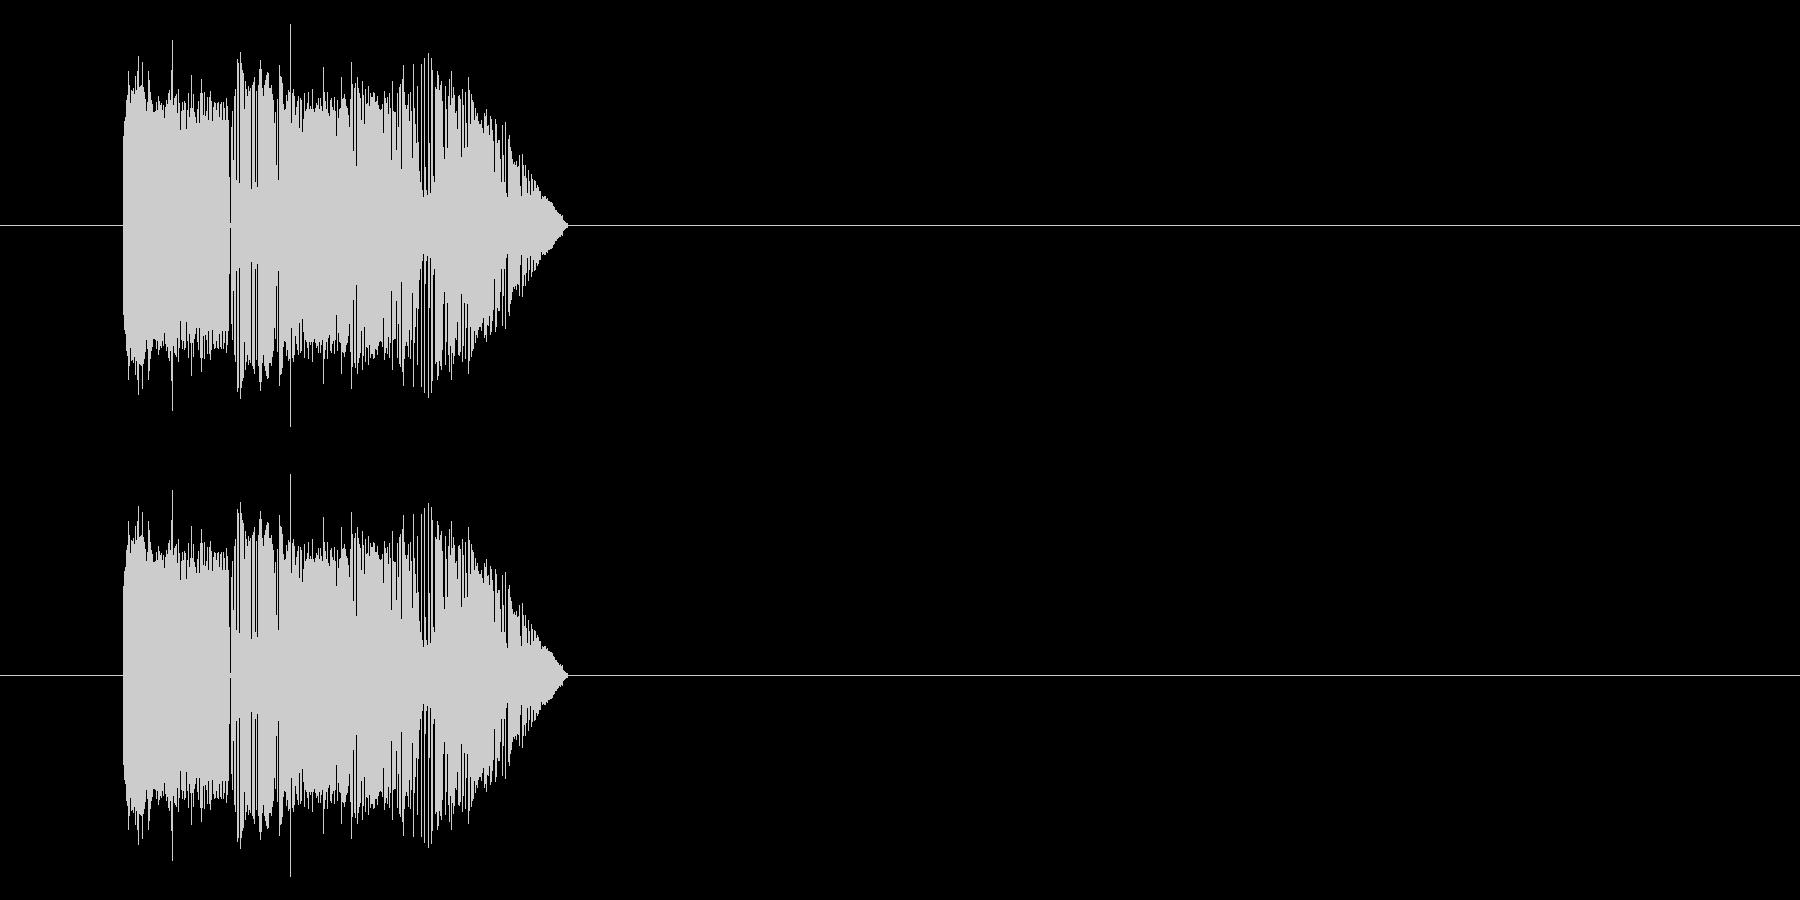 【GB 格闘01-11(攻撃)】 の未再生の波形